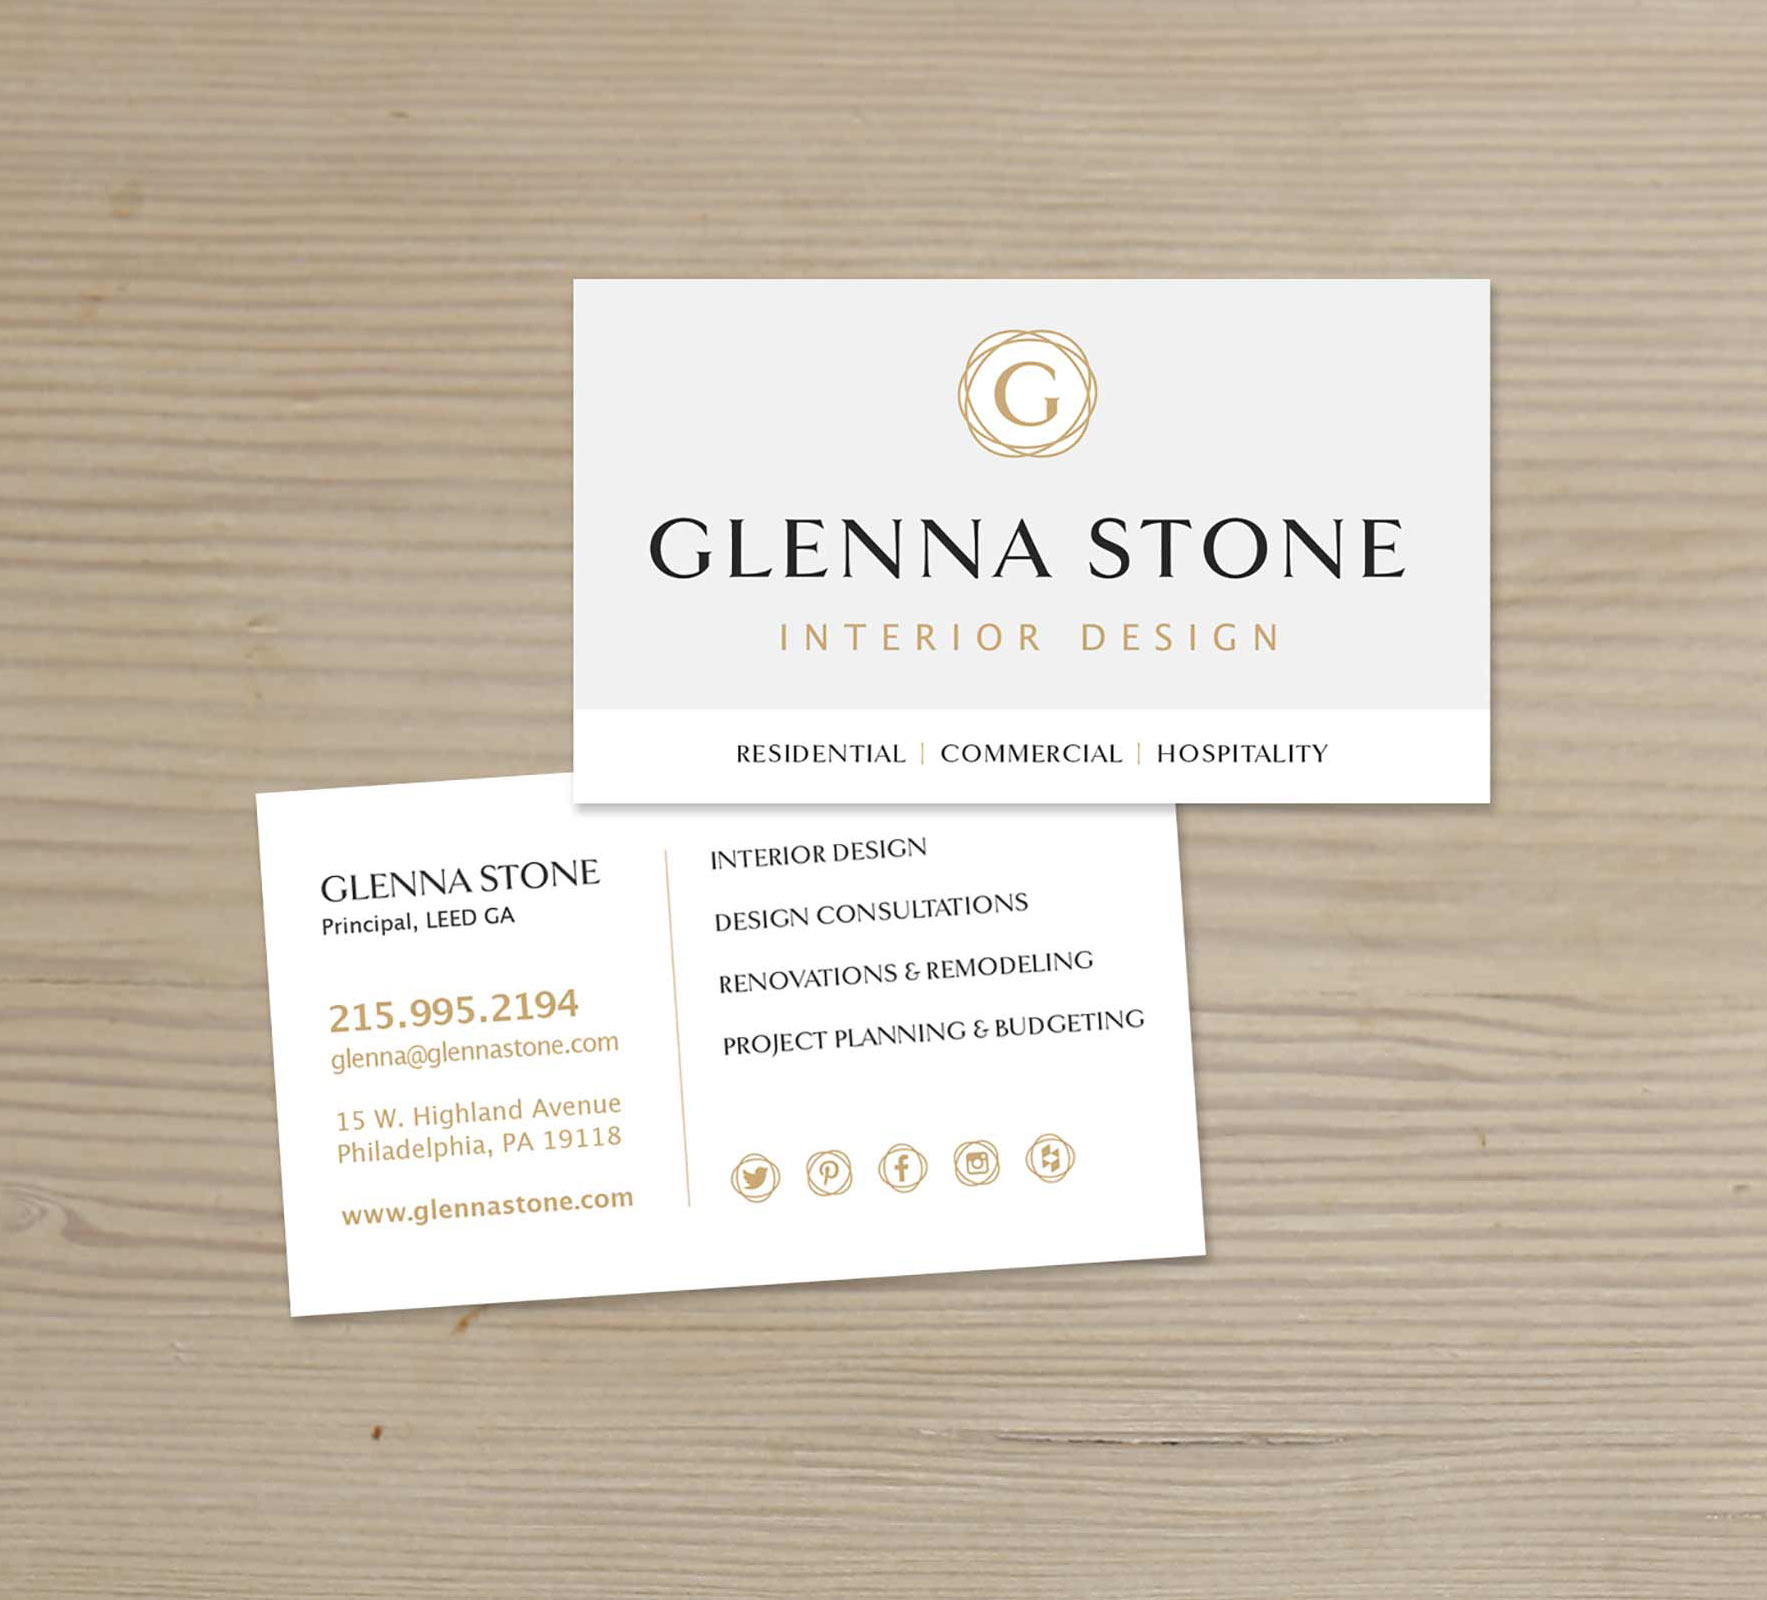 Glenna Stone Interior Design